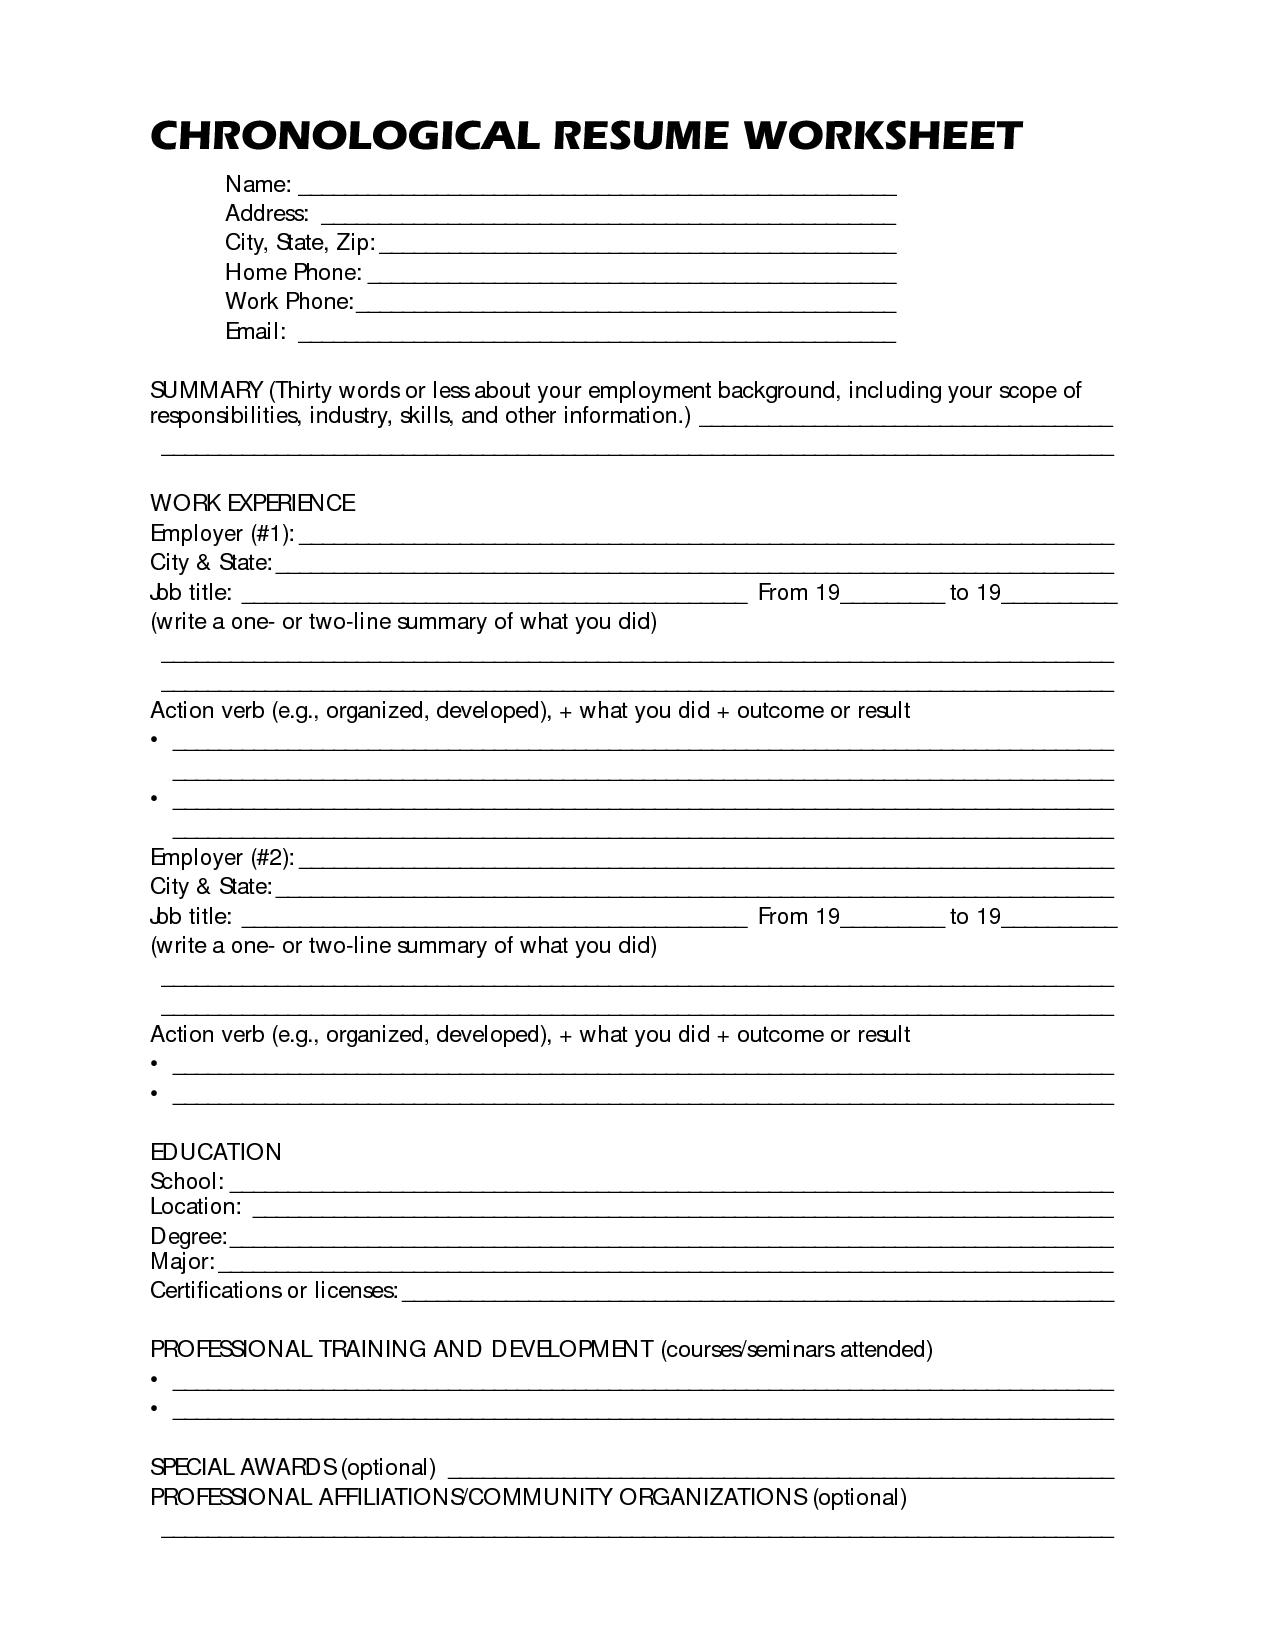 resume builder worksheet jet engine mechanic accounts payable job